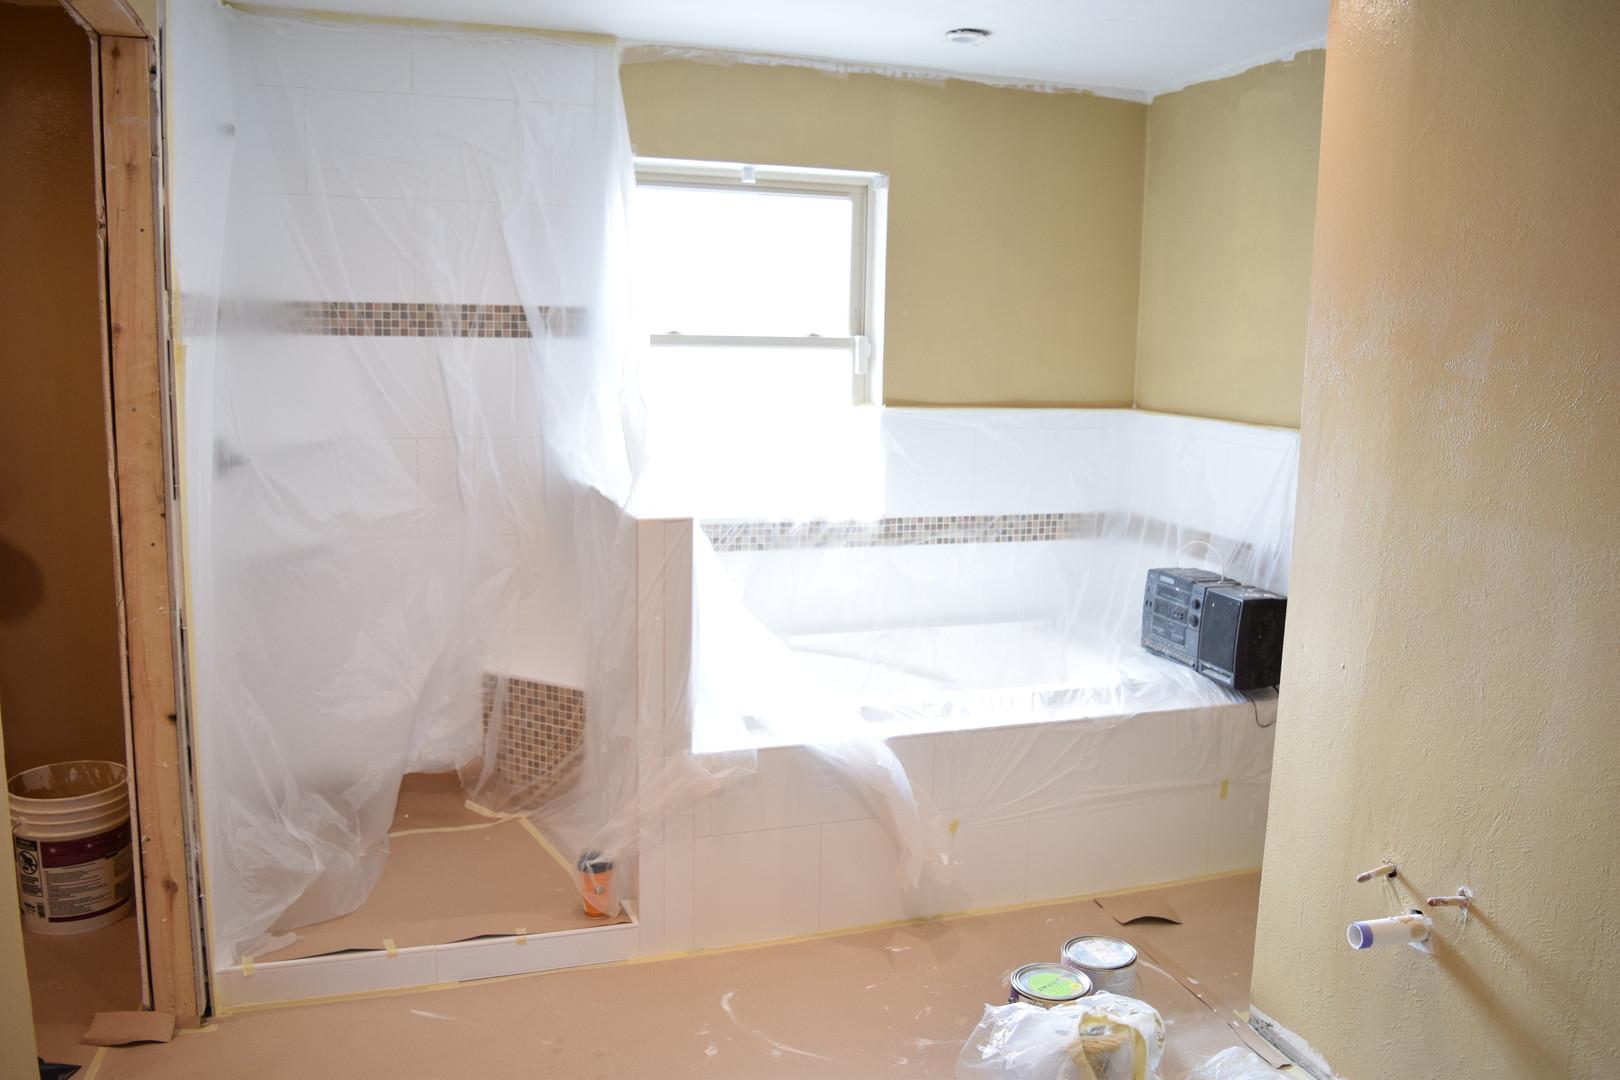 Bathroom Remodel Phase